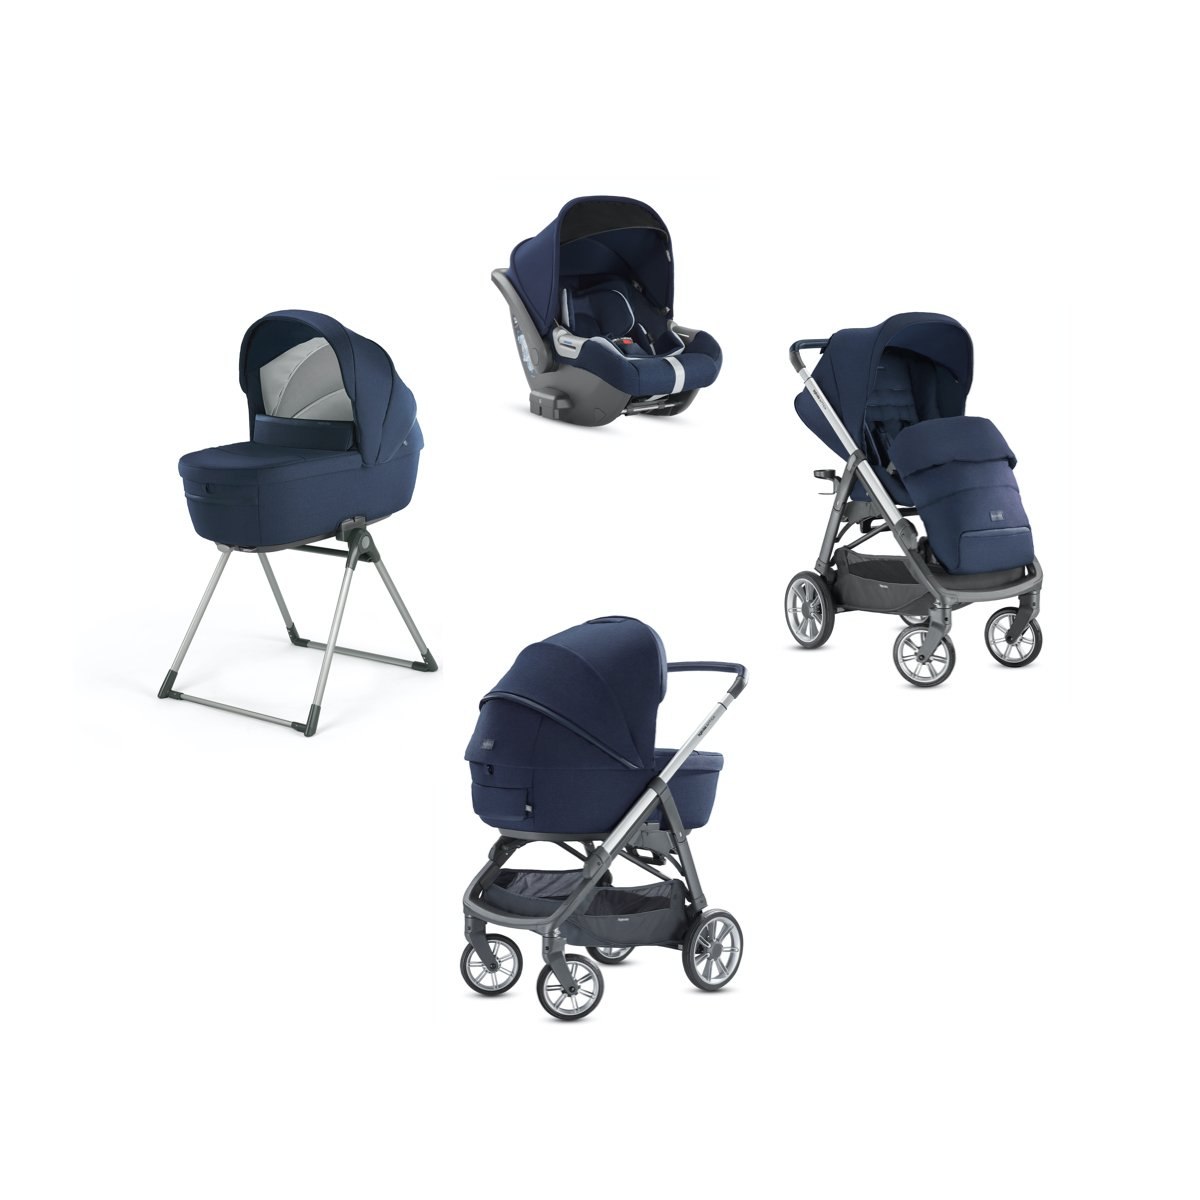 Inglesina Stroller Aptica System Quattro including Infant ...